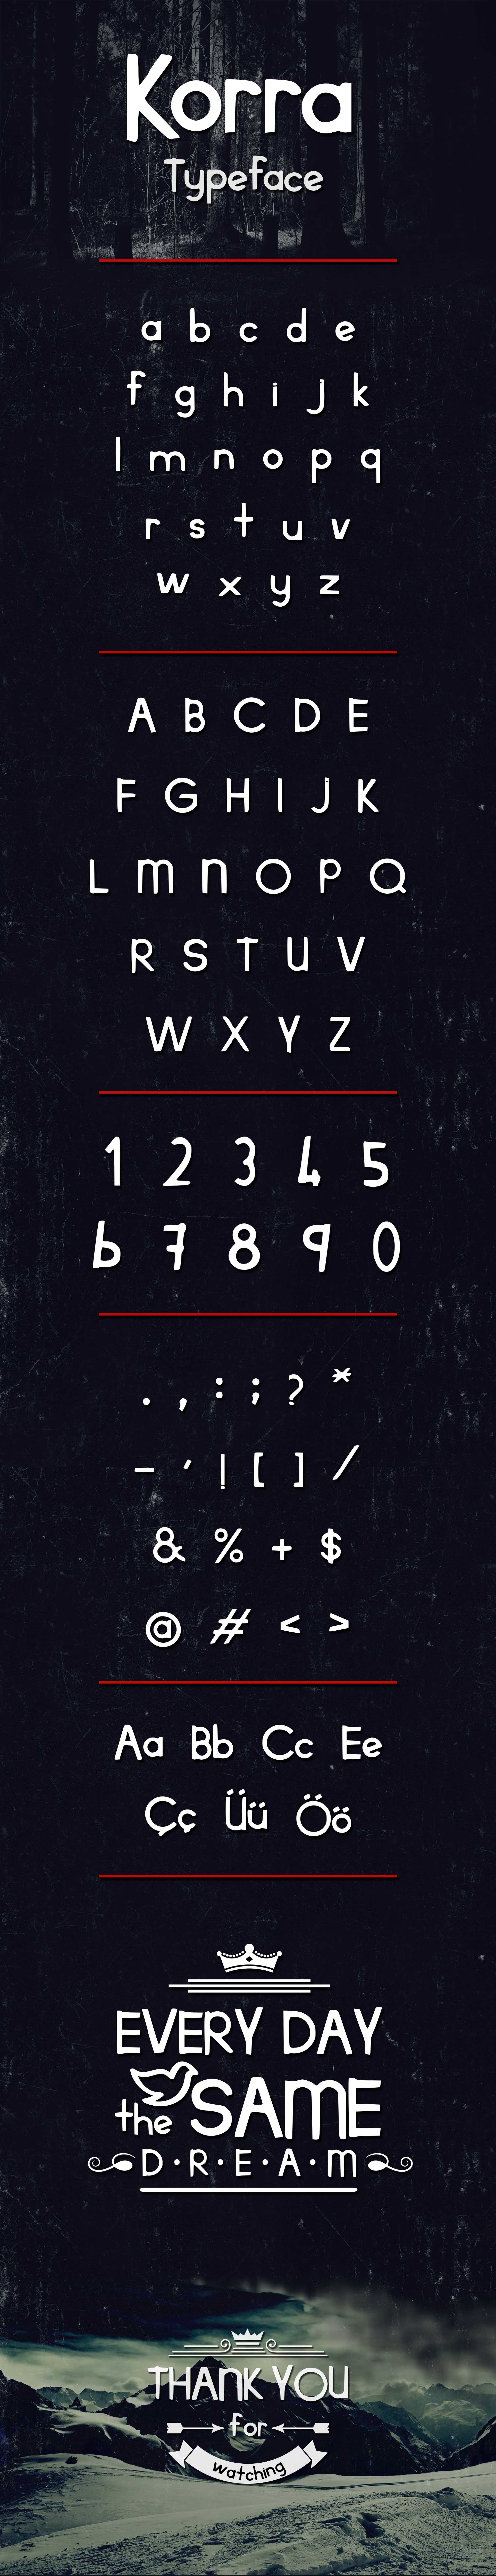 Korra font